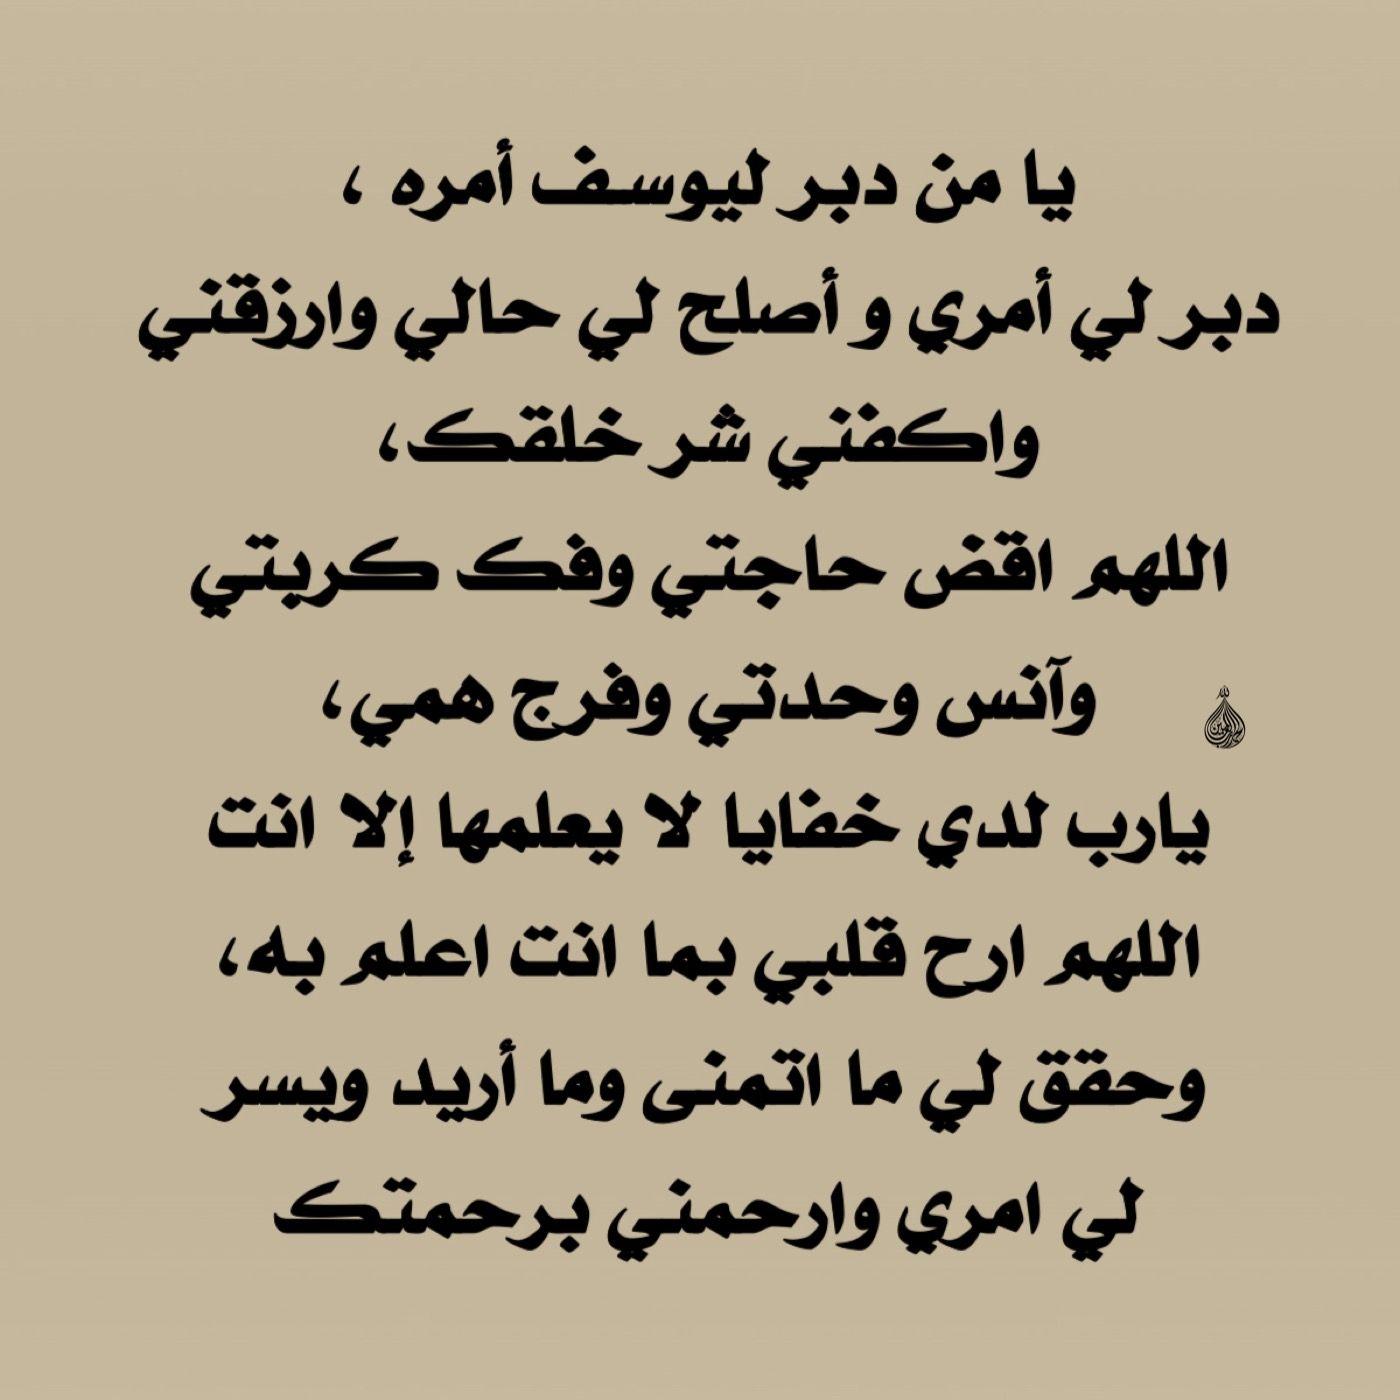 Pin By Saleh On Doaa Islamic Art Calligraphy Islamic Quotes Islam Quran